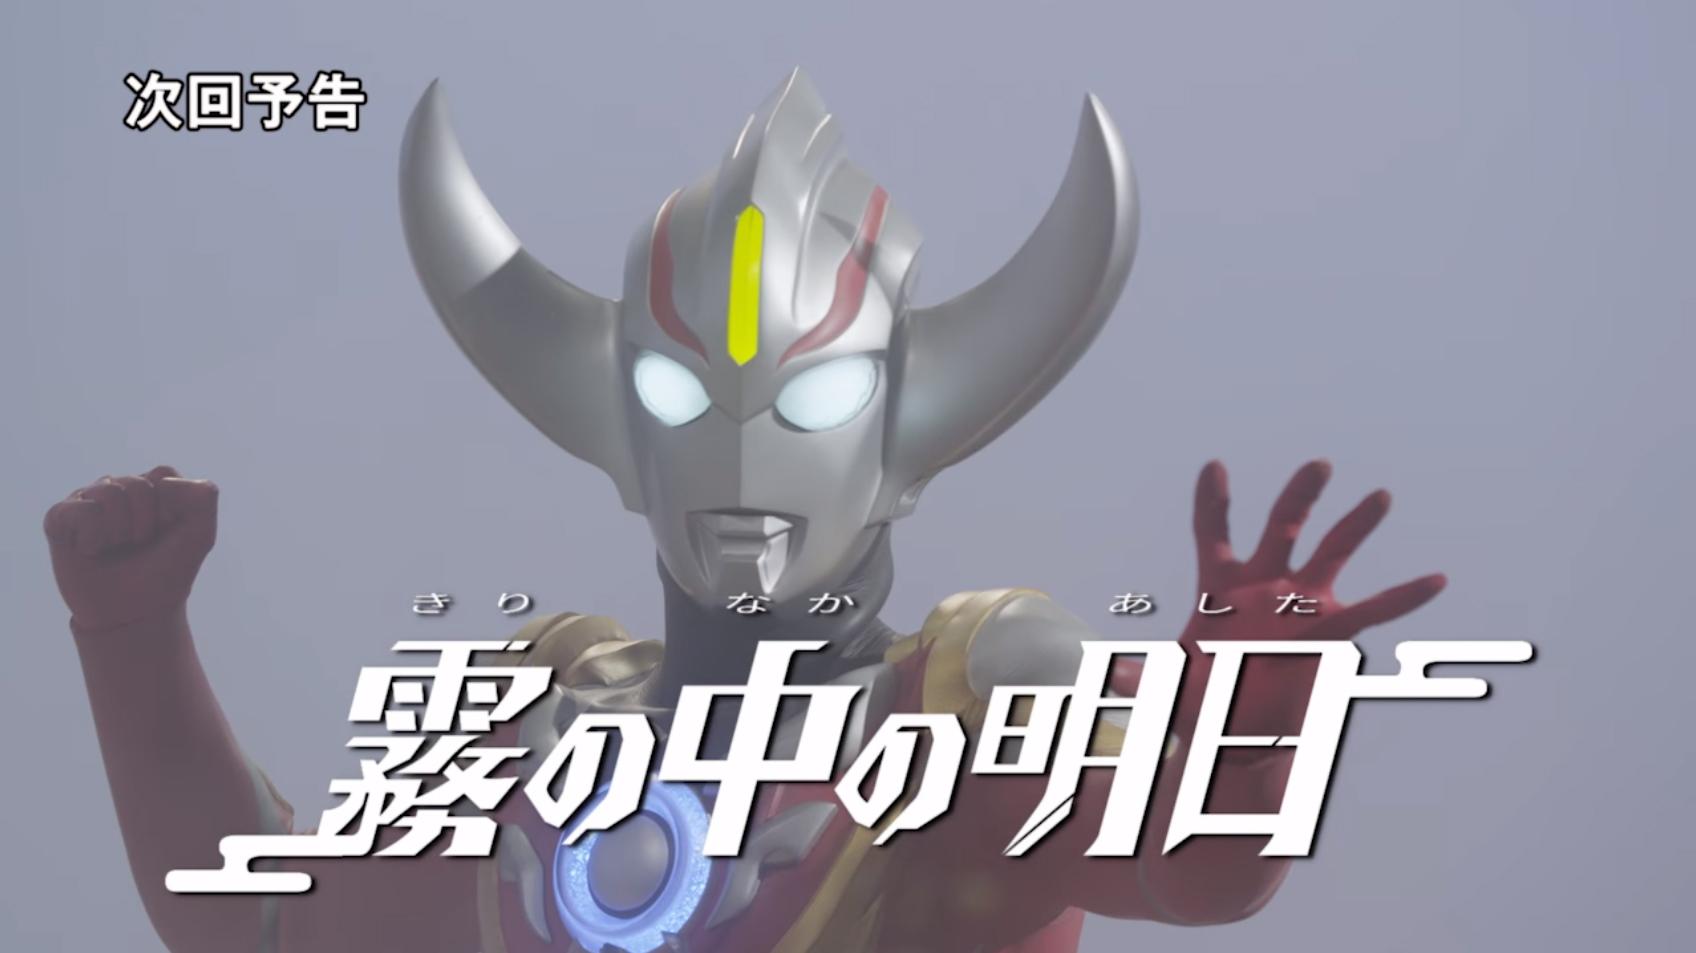 Next Time On Ultraman Orb: Episode 7